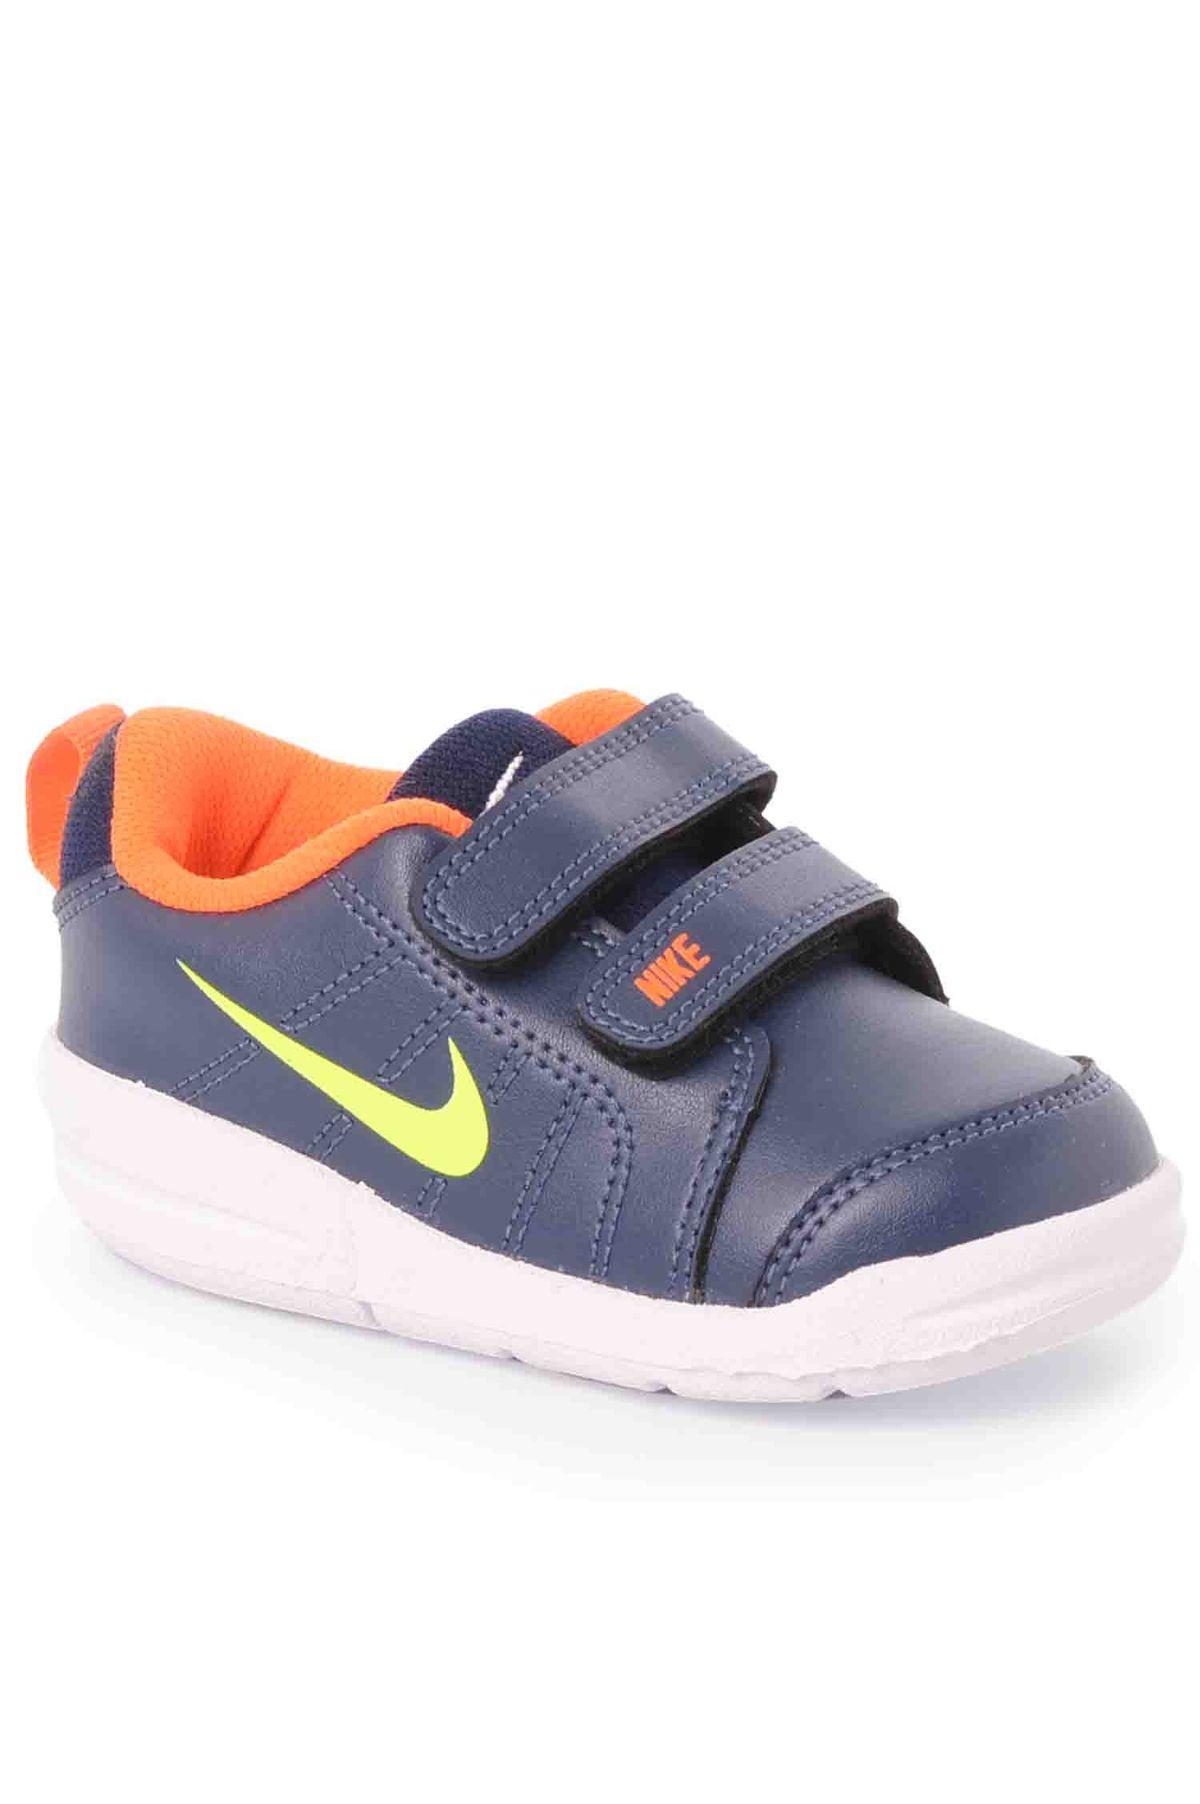 147debda7c3 Tênis Infantil Nike Pico Lt